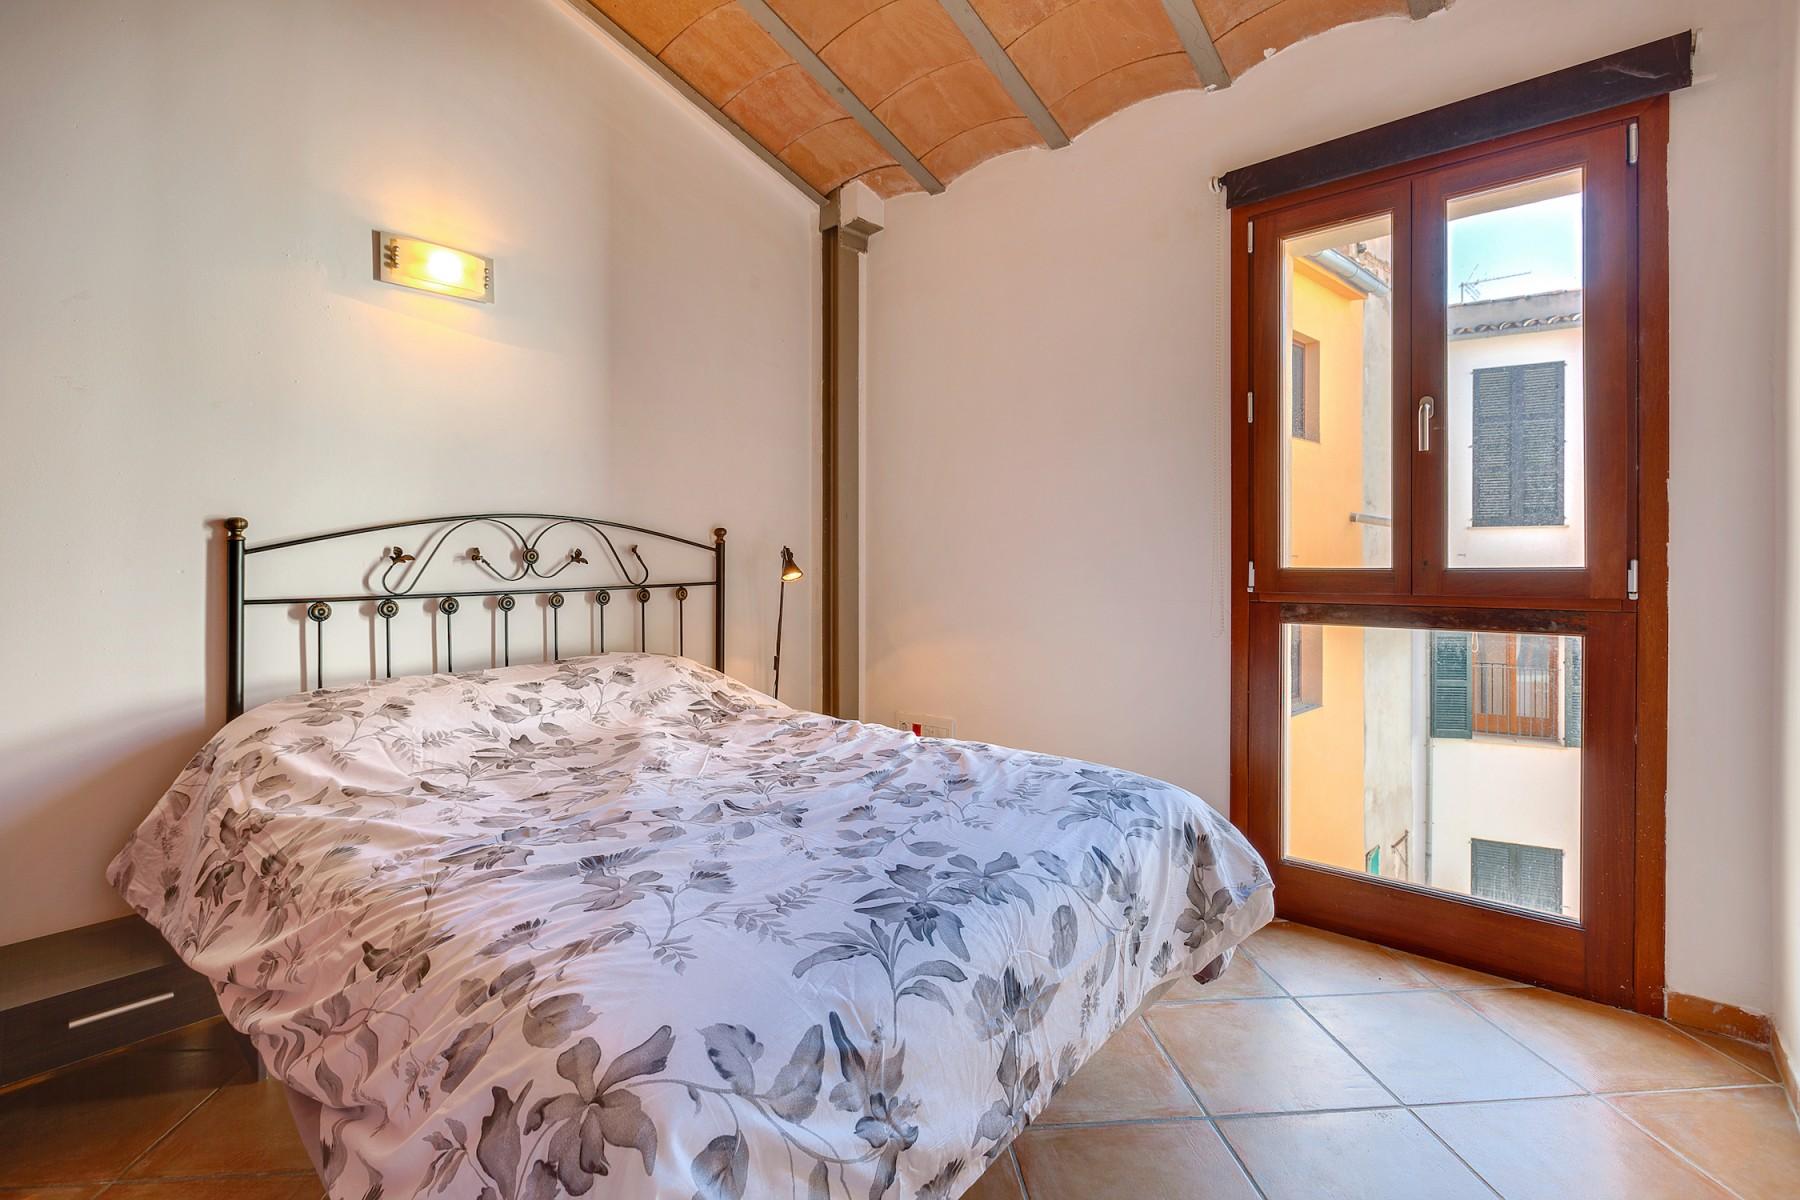 STYLE PALMA 1º A - TURISMO DE INTERIOR - Apartments in ...